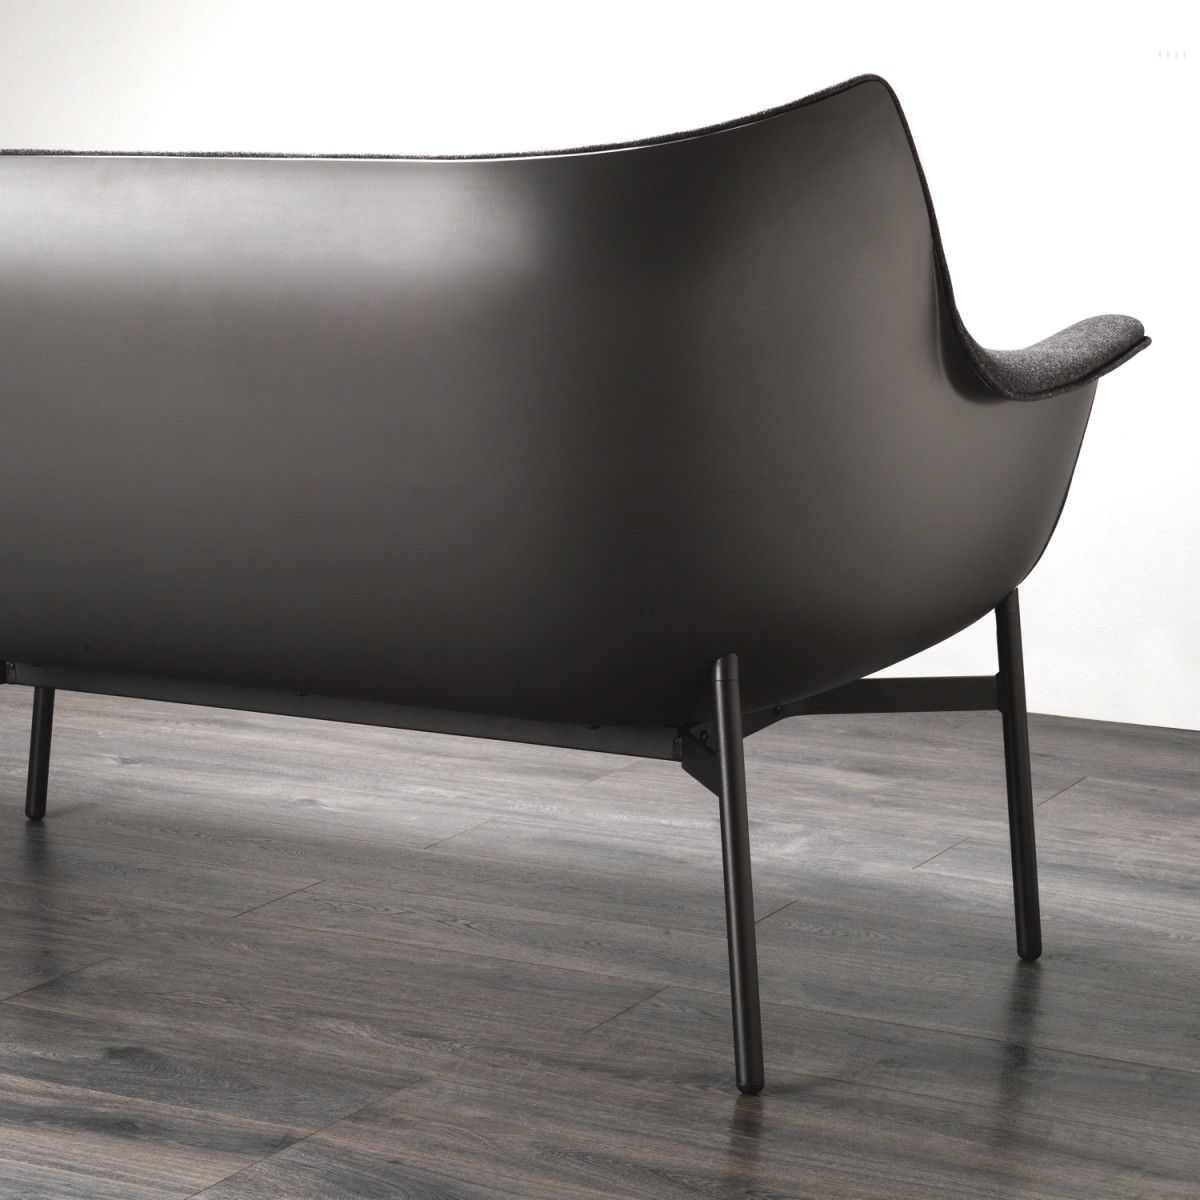 Ikea hay debut their sleek minimalist furniture collection id es pour la maison furniture - Ikea tissus d ameublement ...